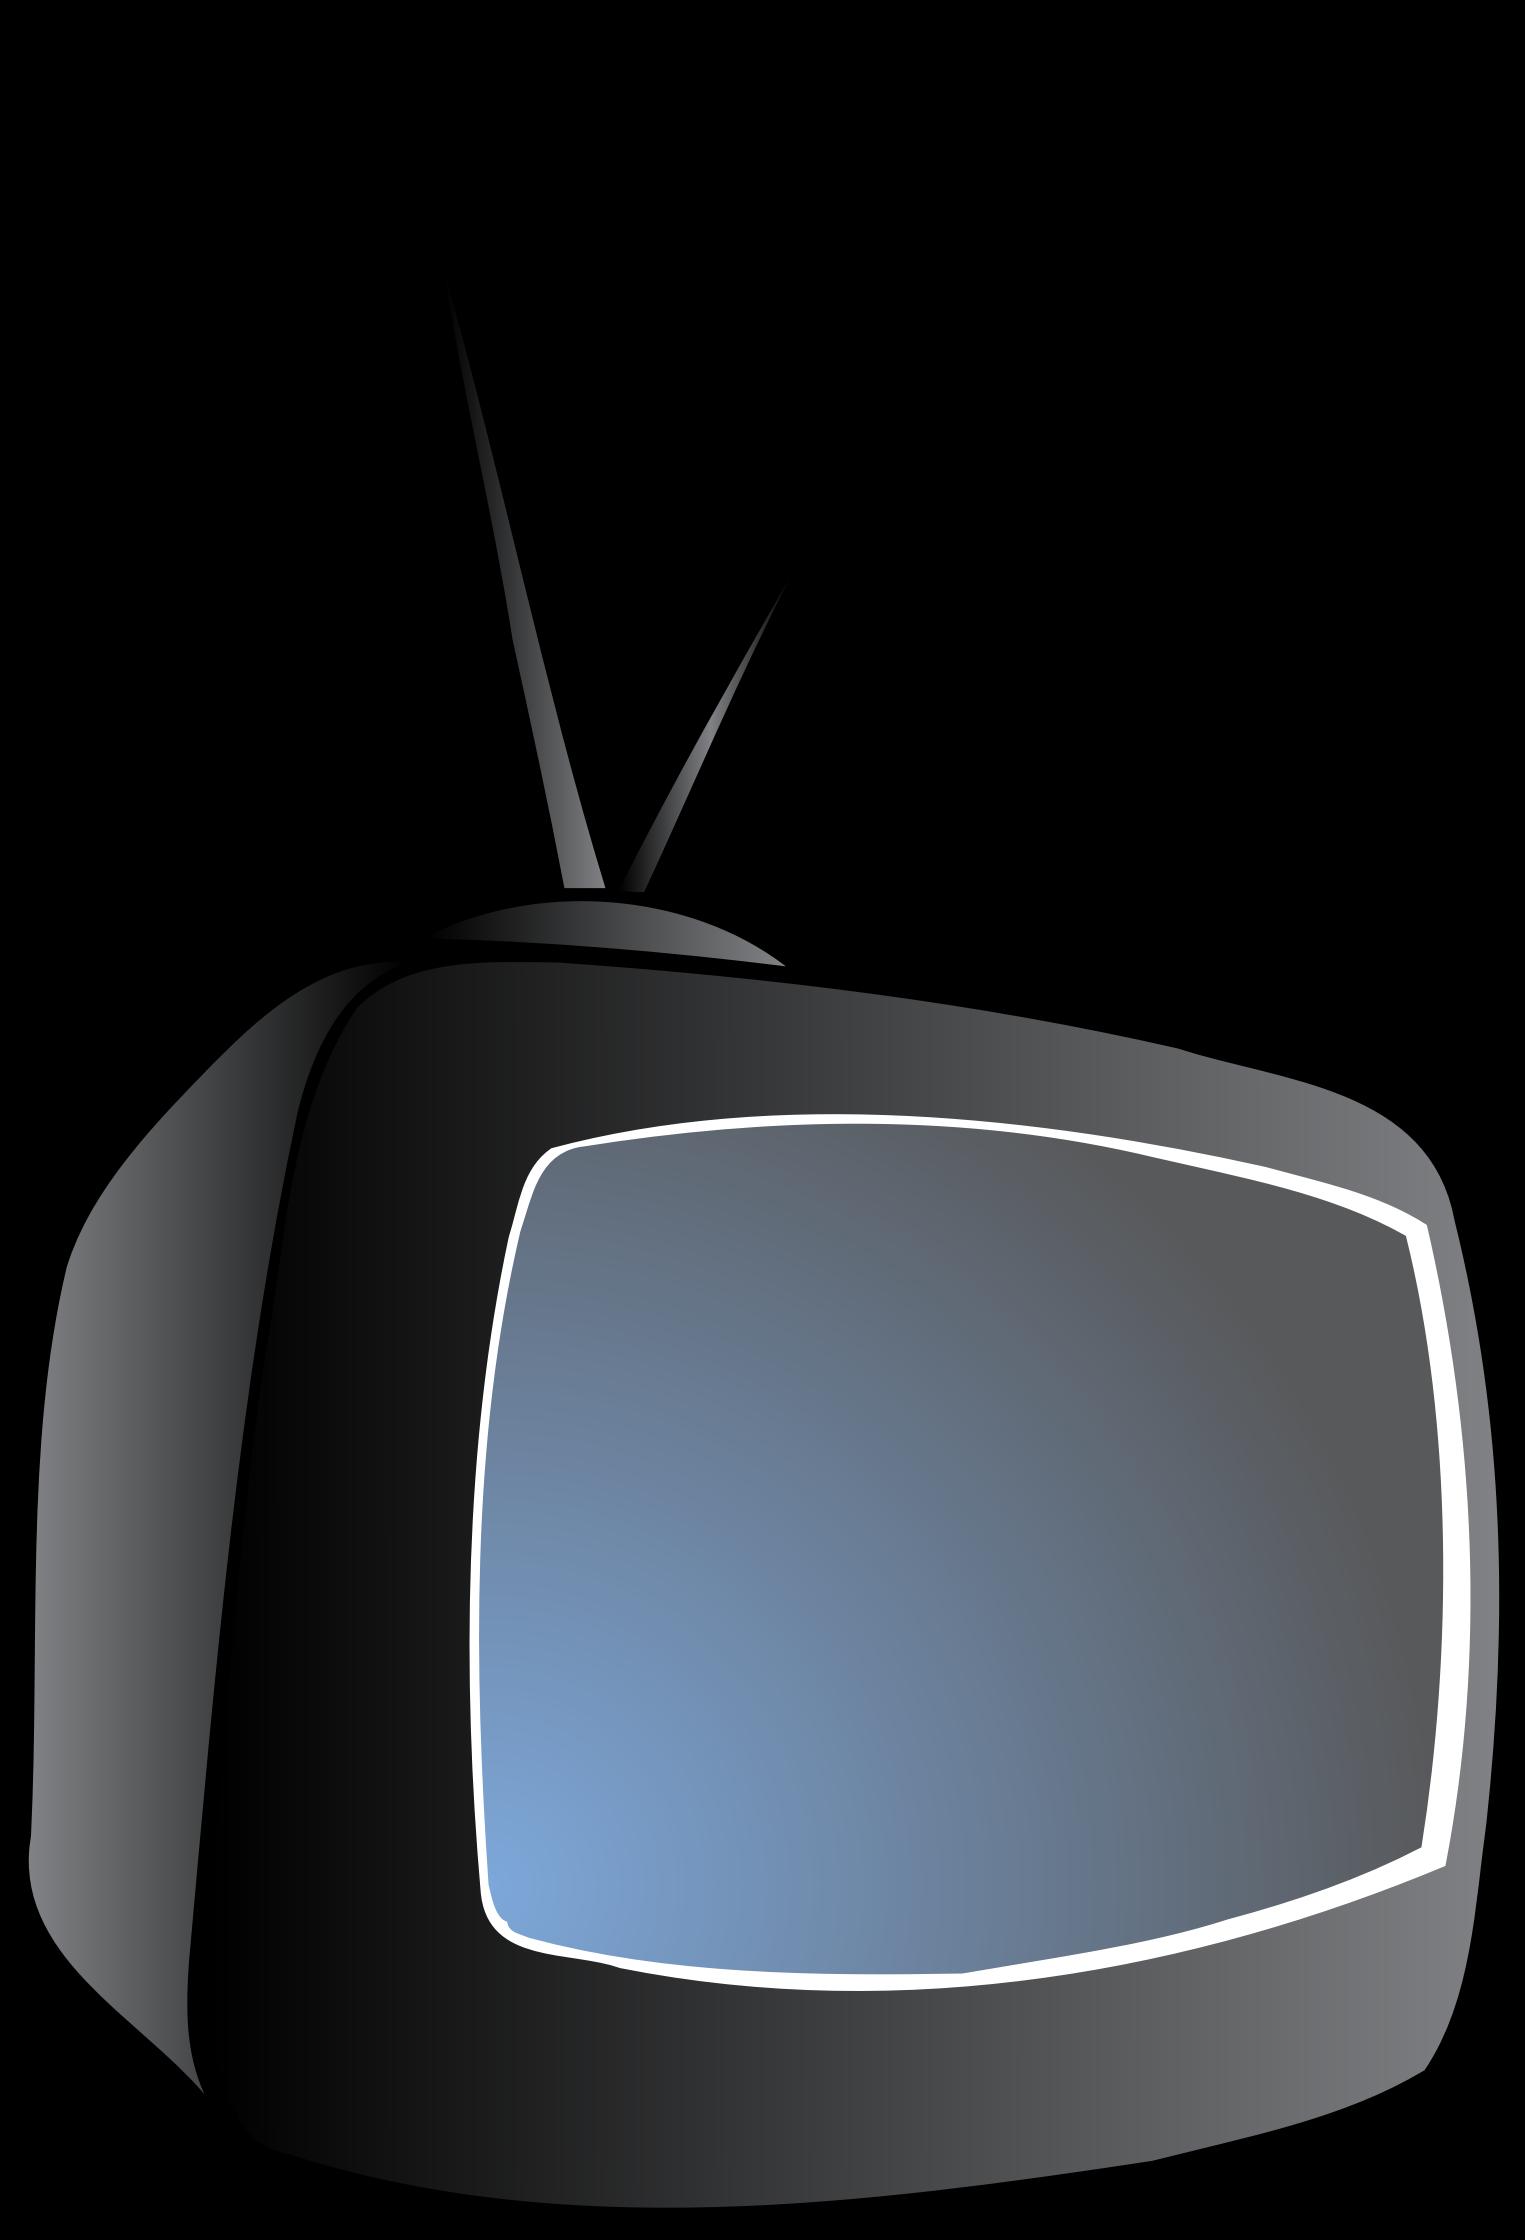 Television clipart tv set. Raseone big image png